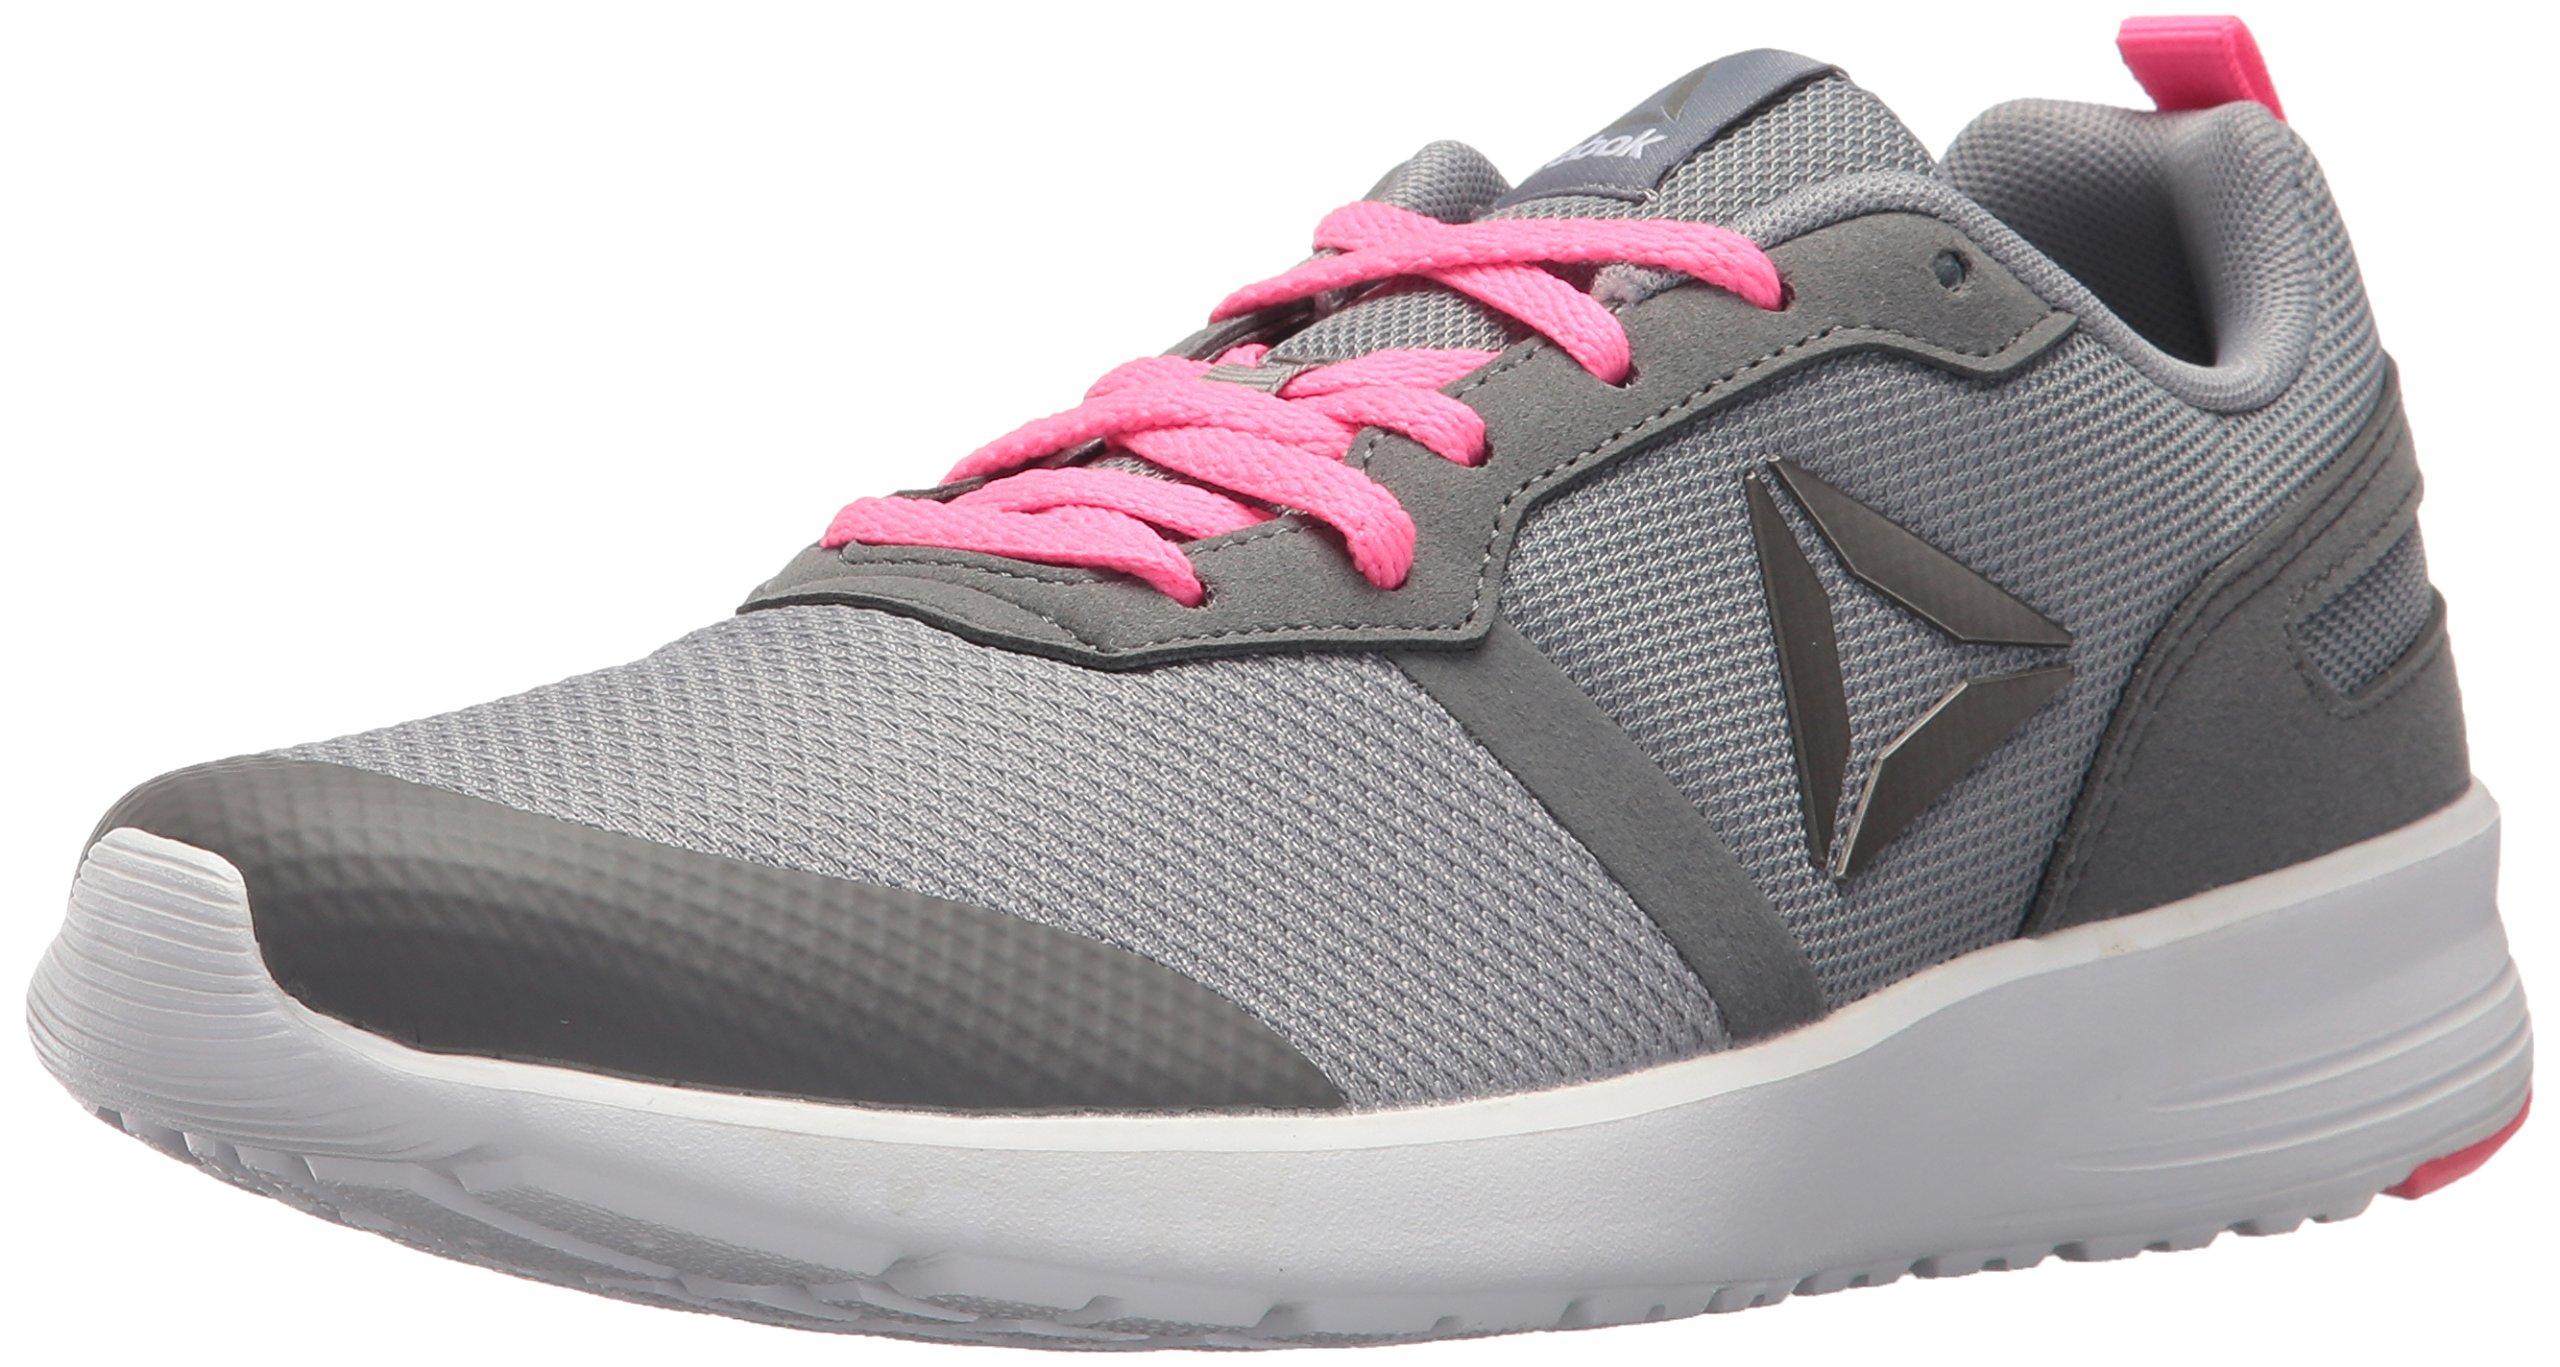 Reebok Women's Foster Flyer Track Shoe,flat grey/medium grey/poison pink/white/pewter,6 M US